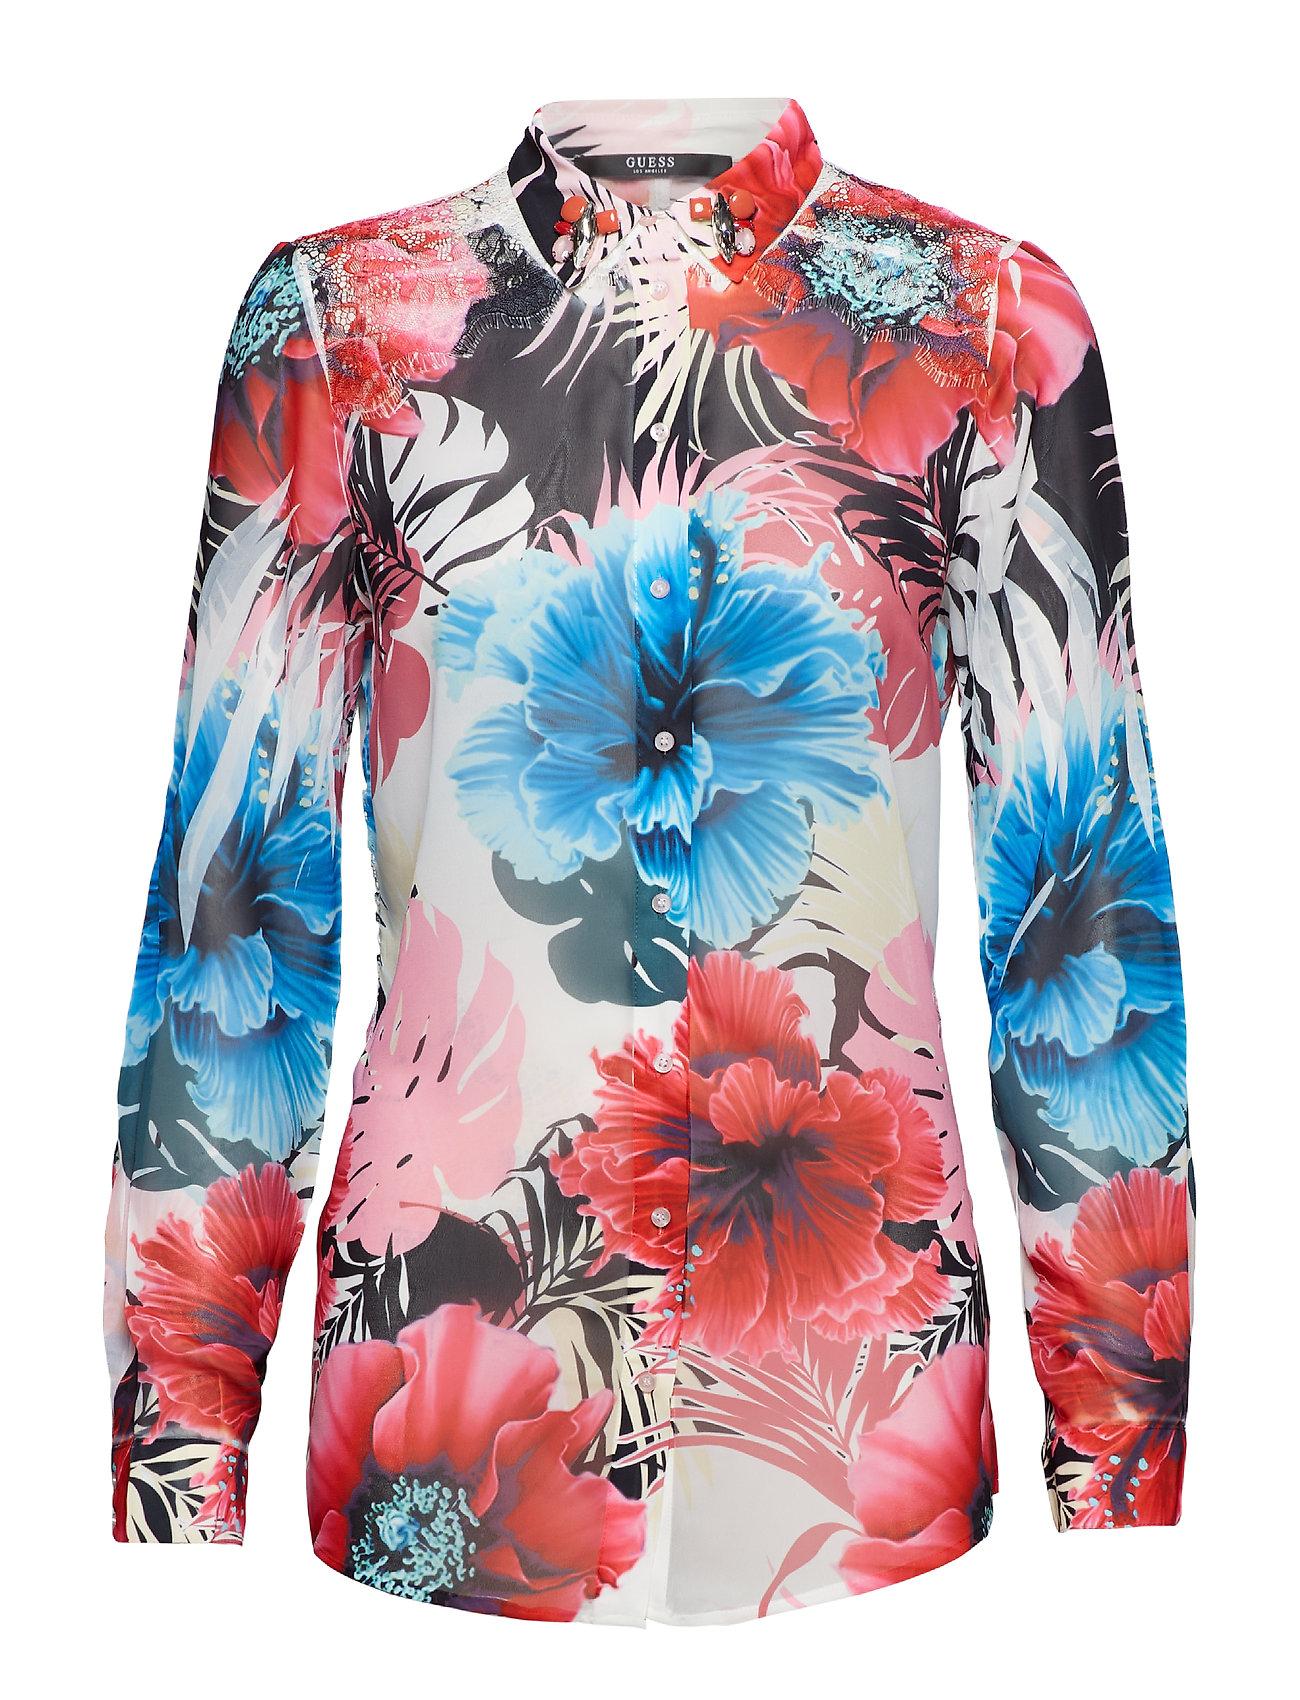 GUESS Jeans LS CLOUIS SHIRT - LUCY FLOWER COMBO